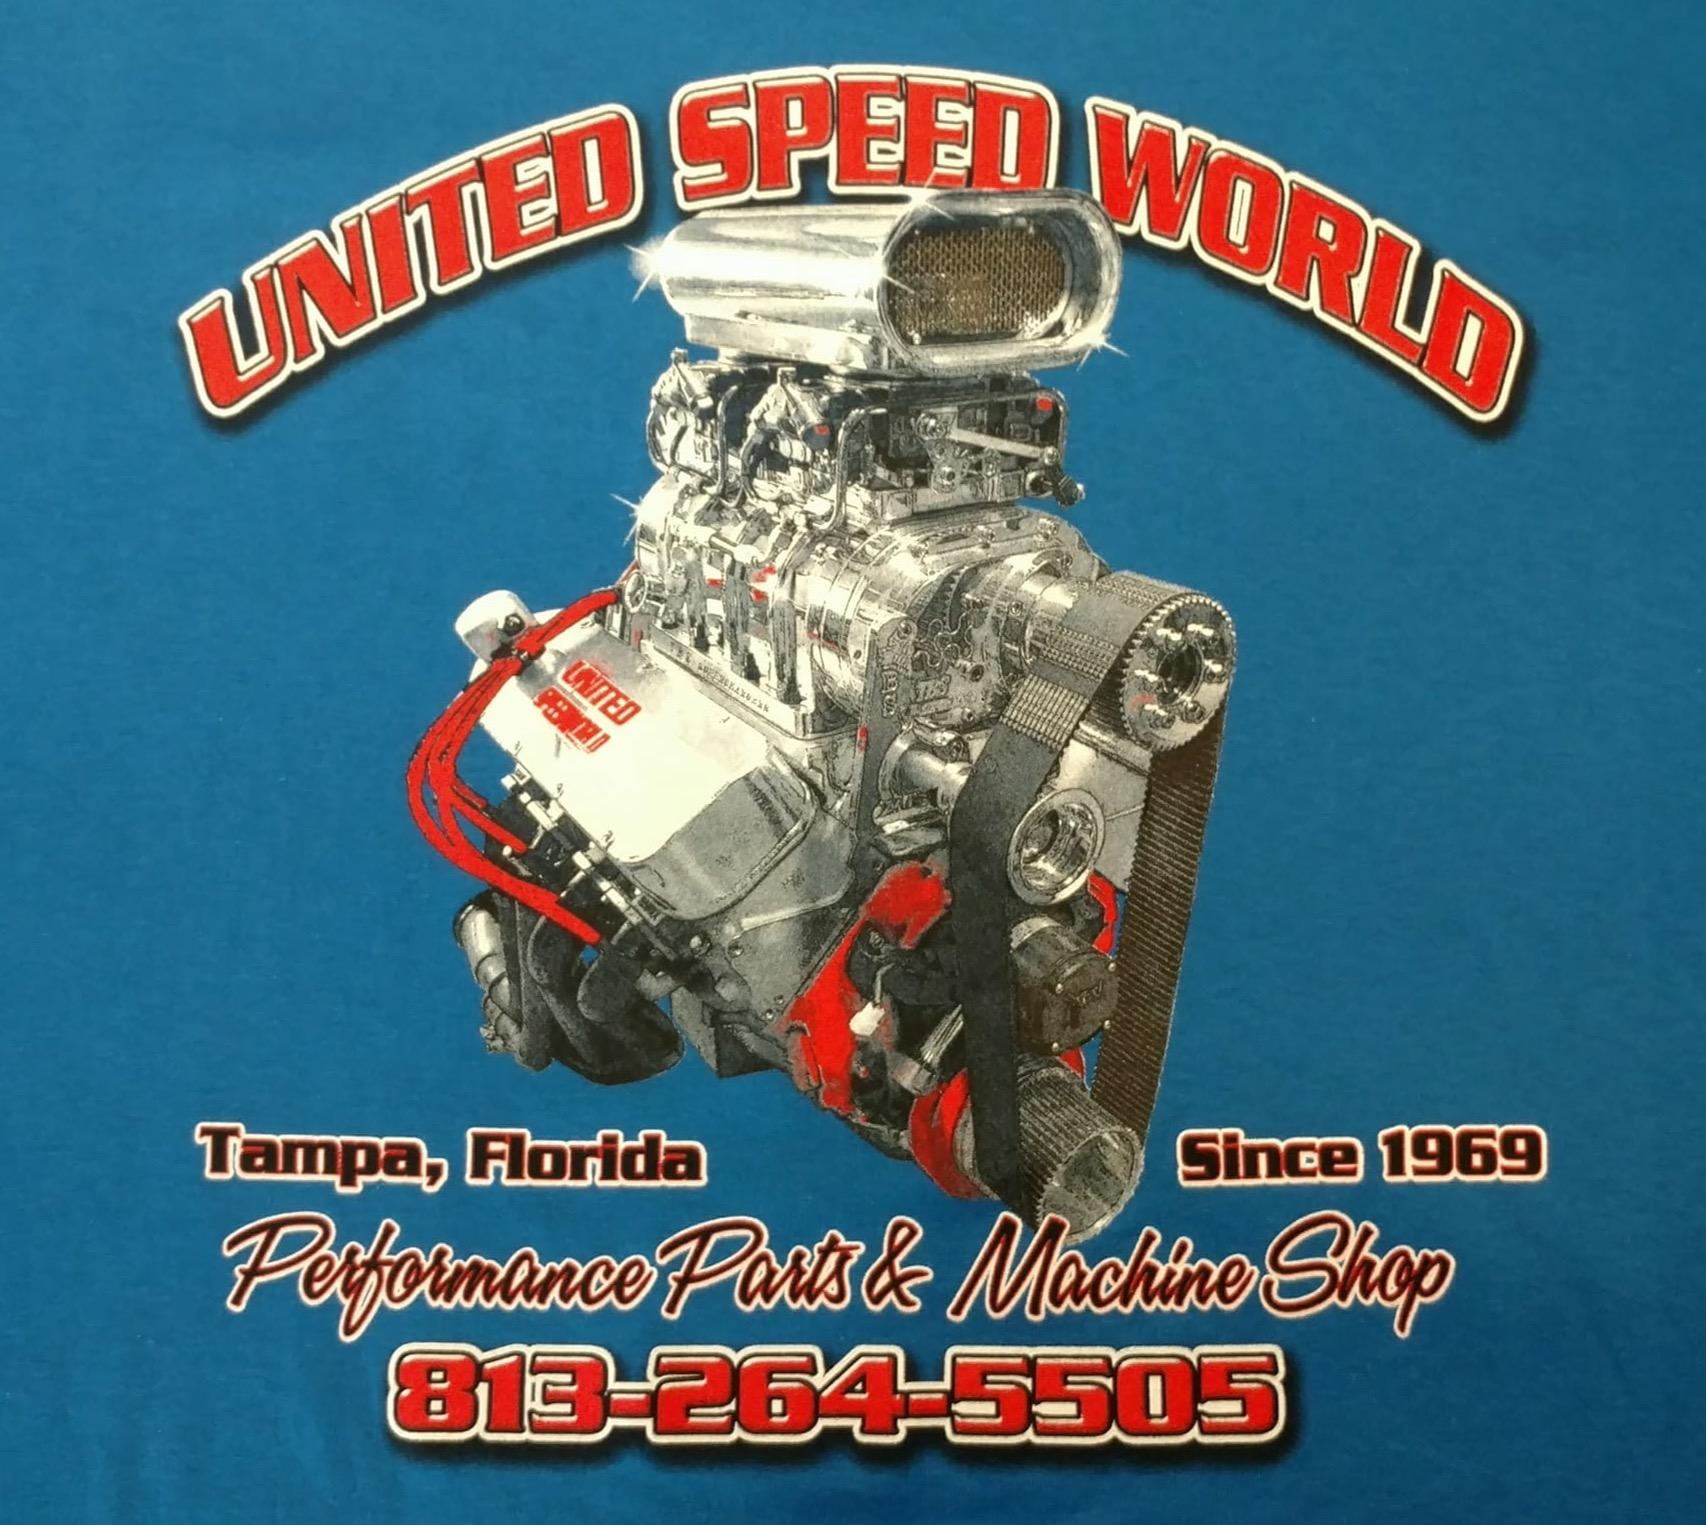 United Speed World